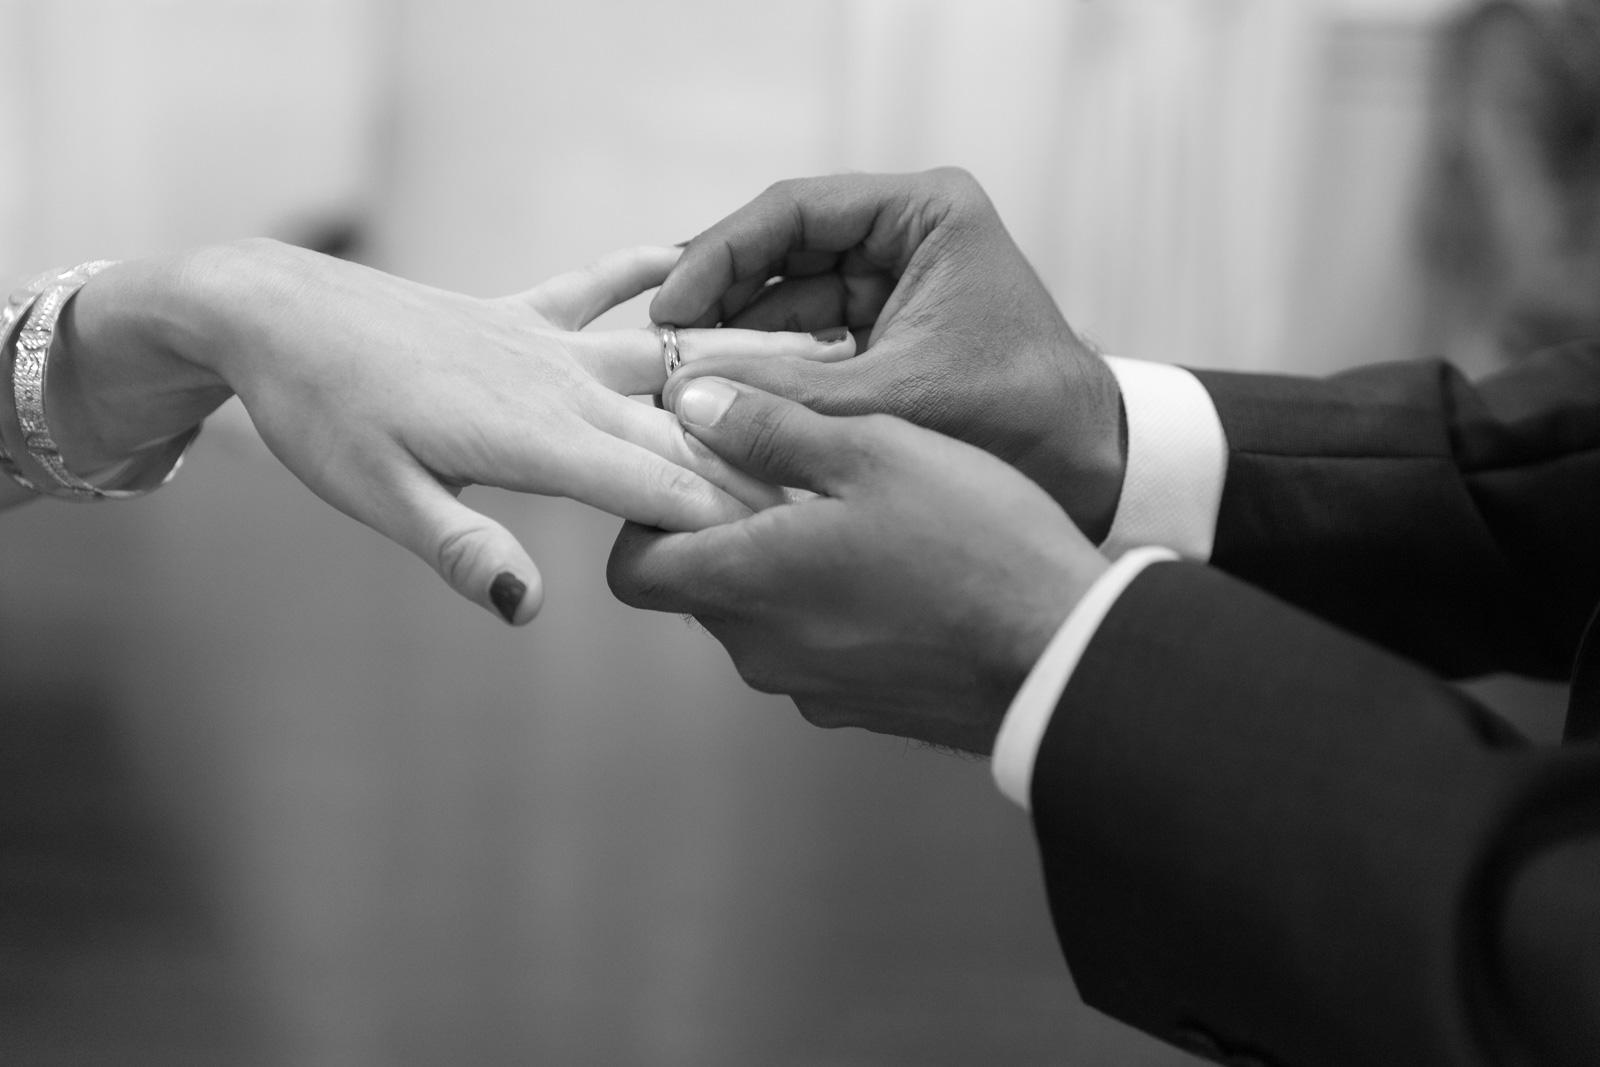 Twickenham wedding ring exchange